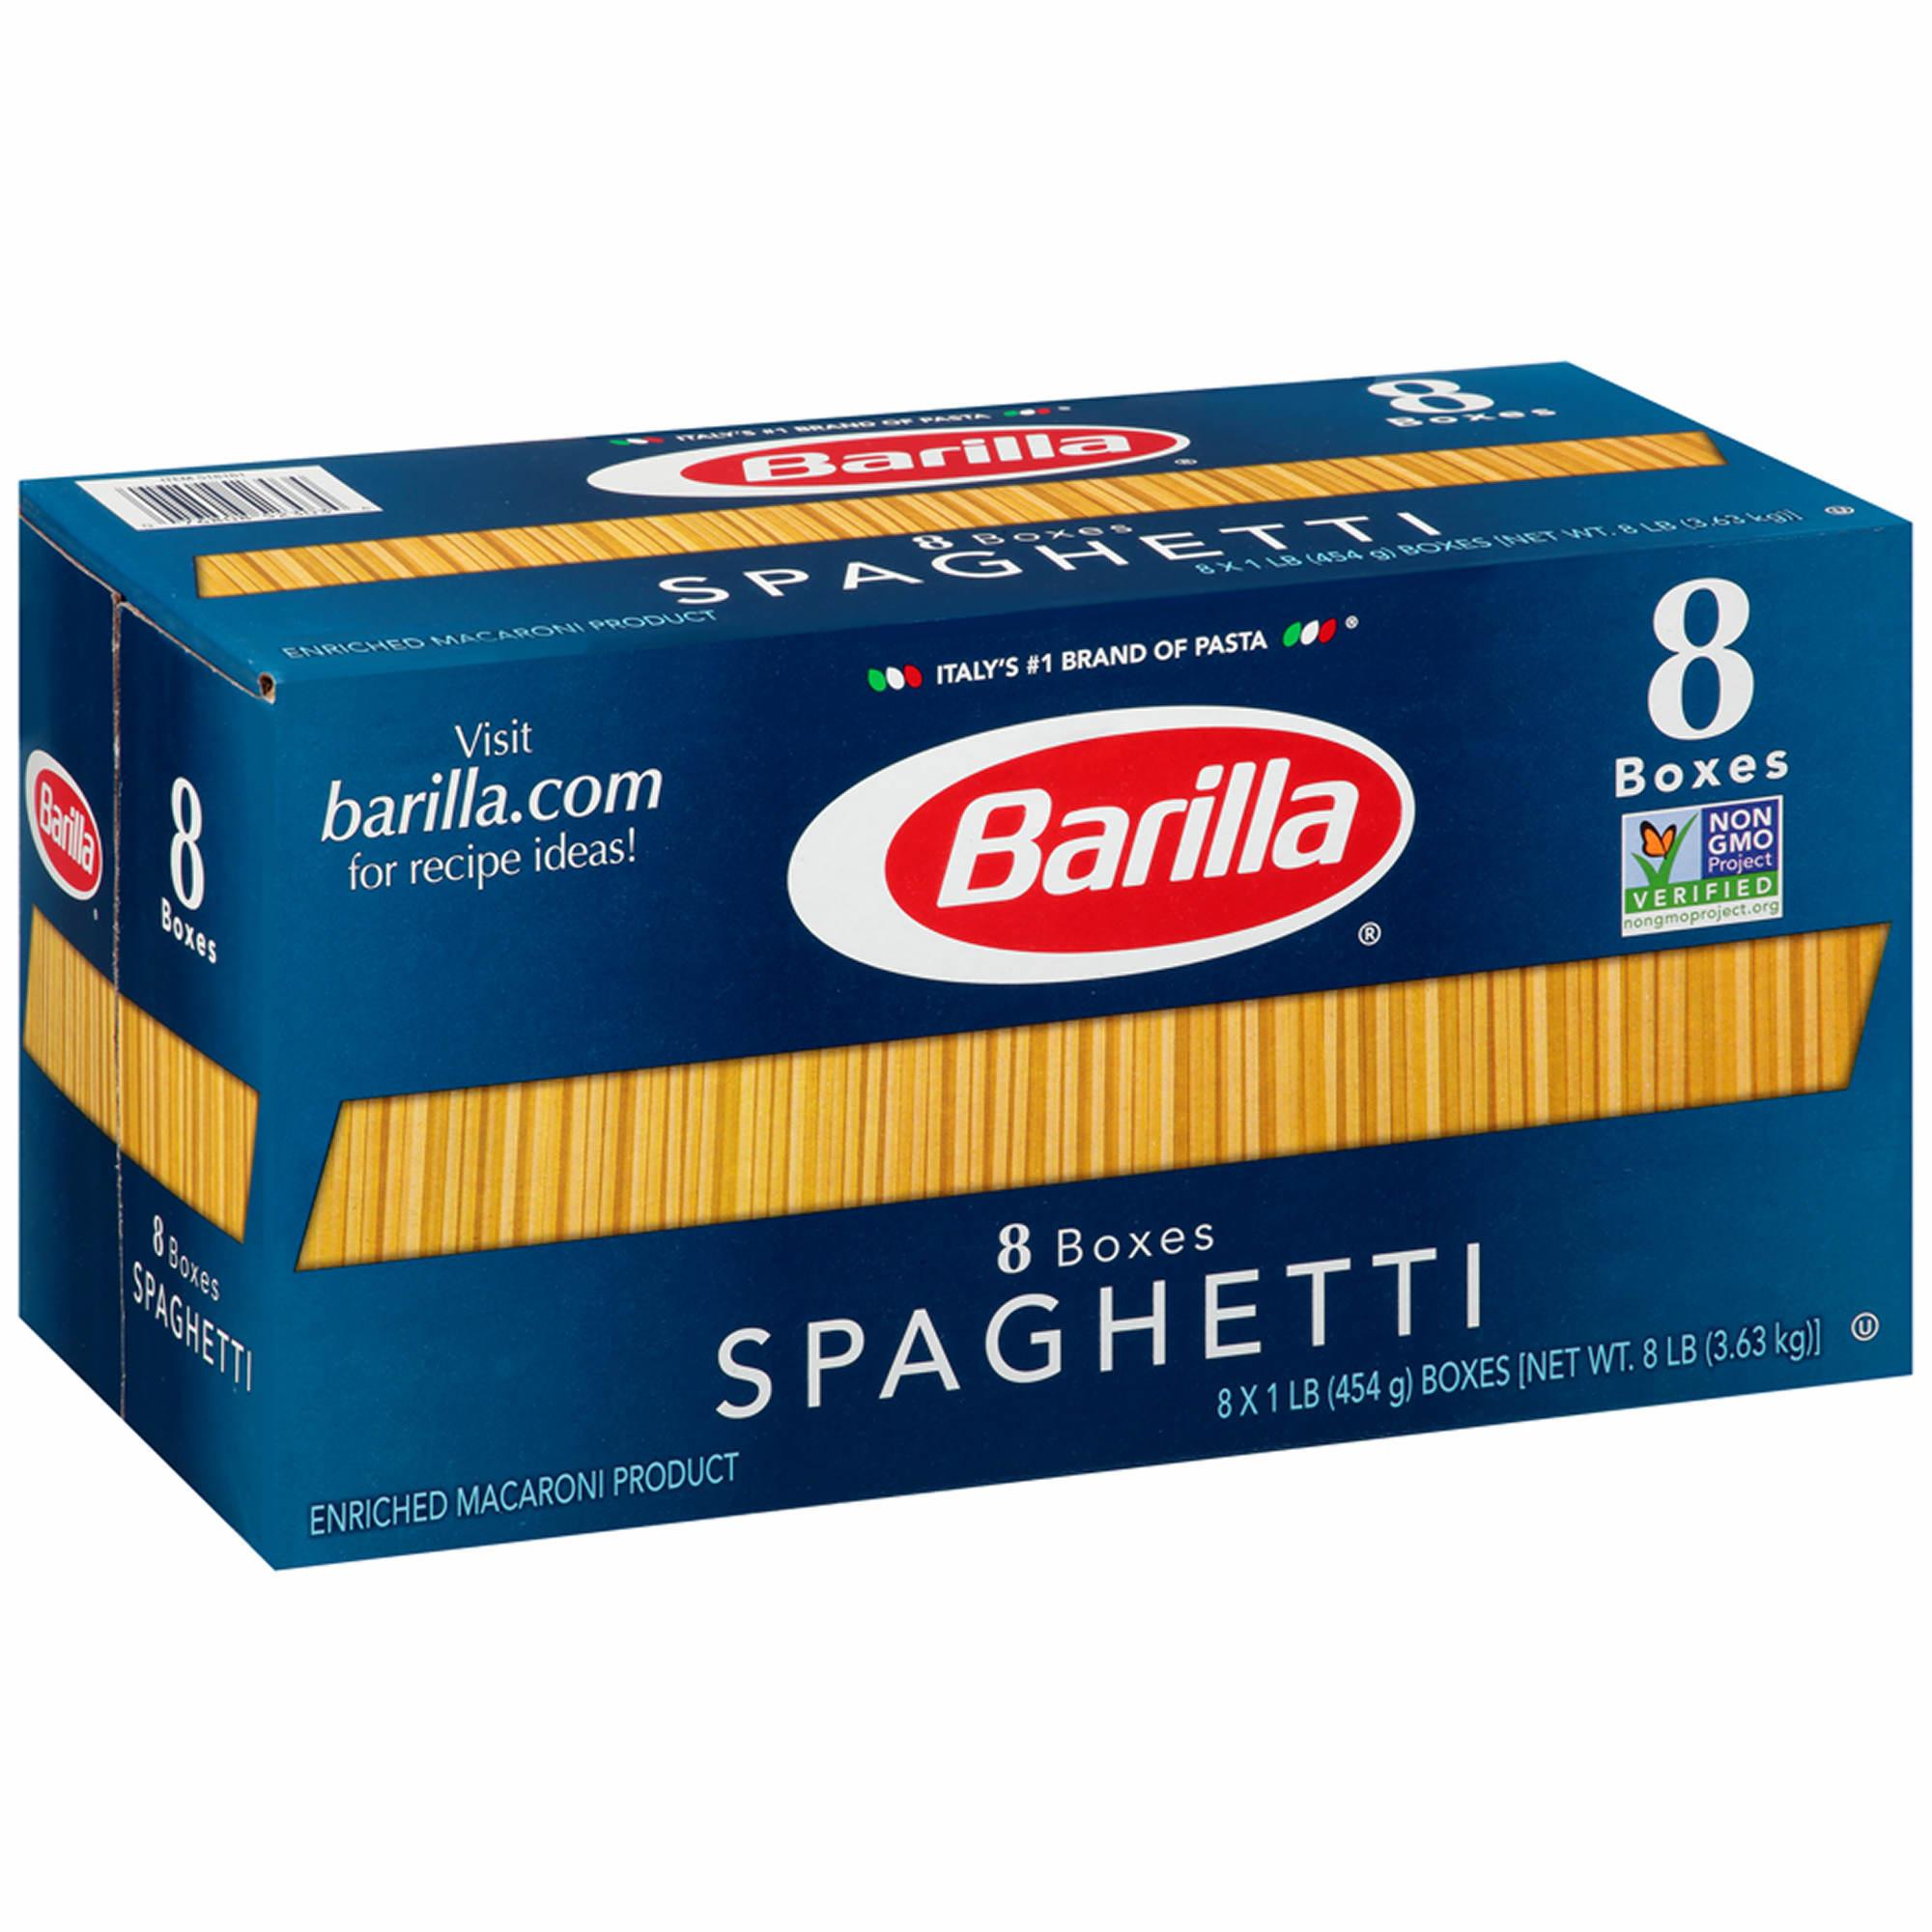 barilla spaghetti pasta oz pk bj s whole club barilla spaghetti pasta 16 oz 8 pk